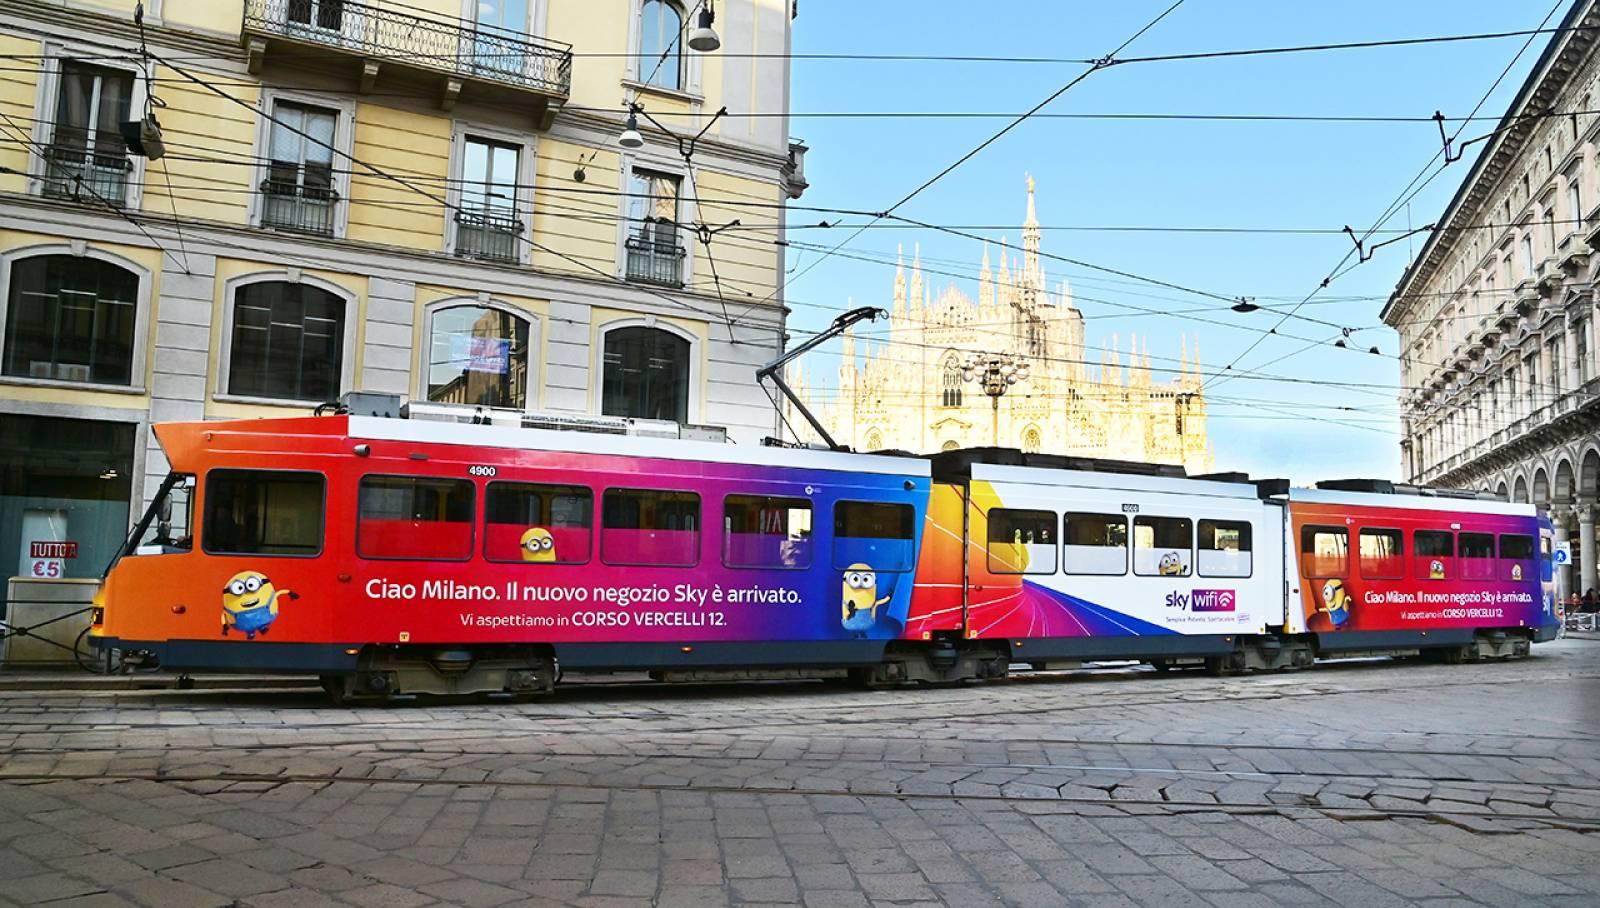 OOH Milano IGPDecaux pubblicità su tram Full-Wrap per SKY Italia